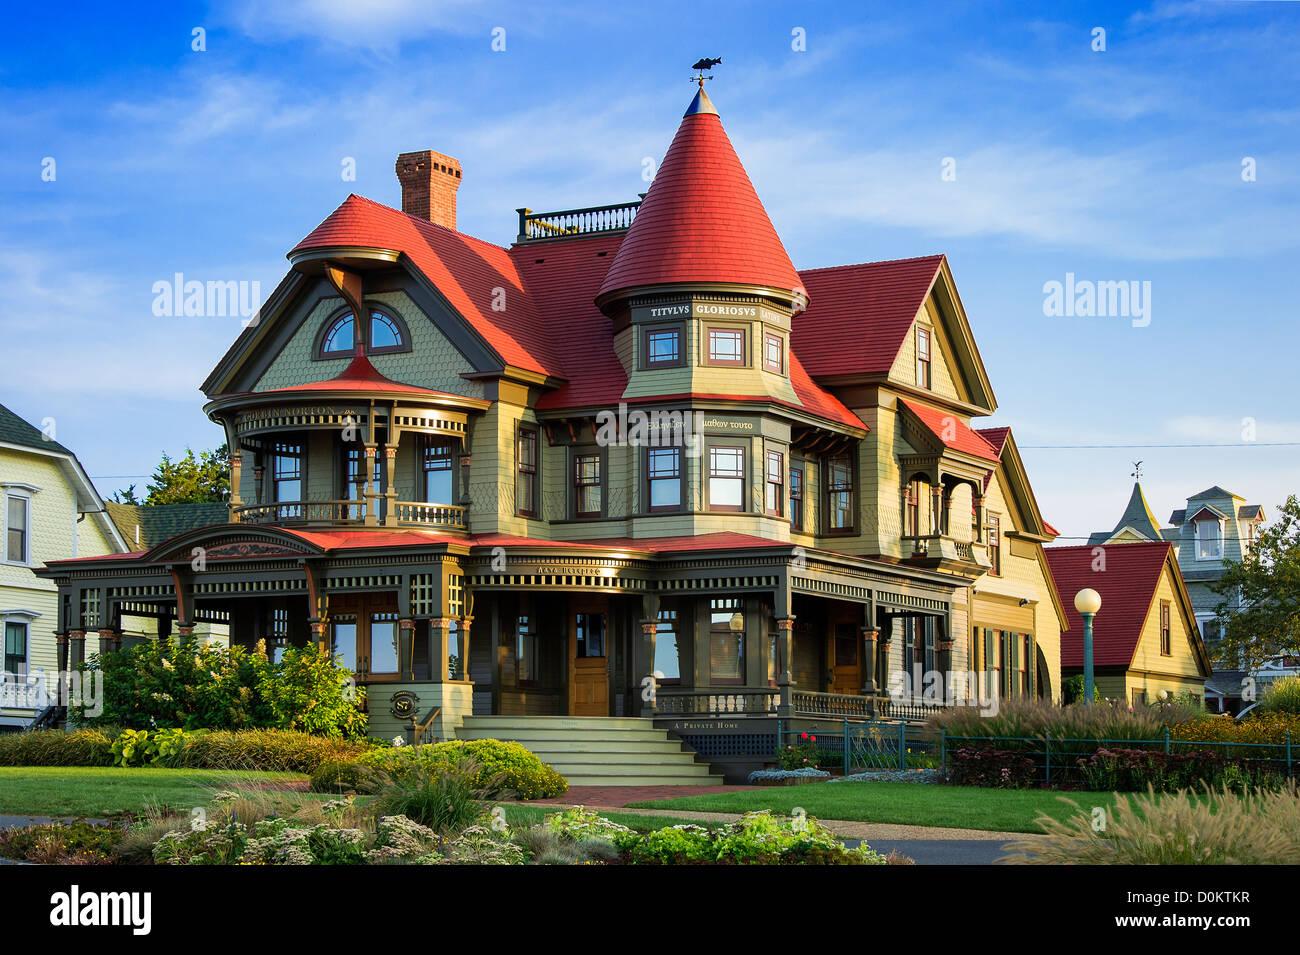 Corbin-Norton house, Ocean Avenue, Oak Bluffs, Martha's Vineyard, Massachusetts, USA - Stock Image